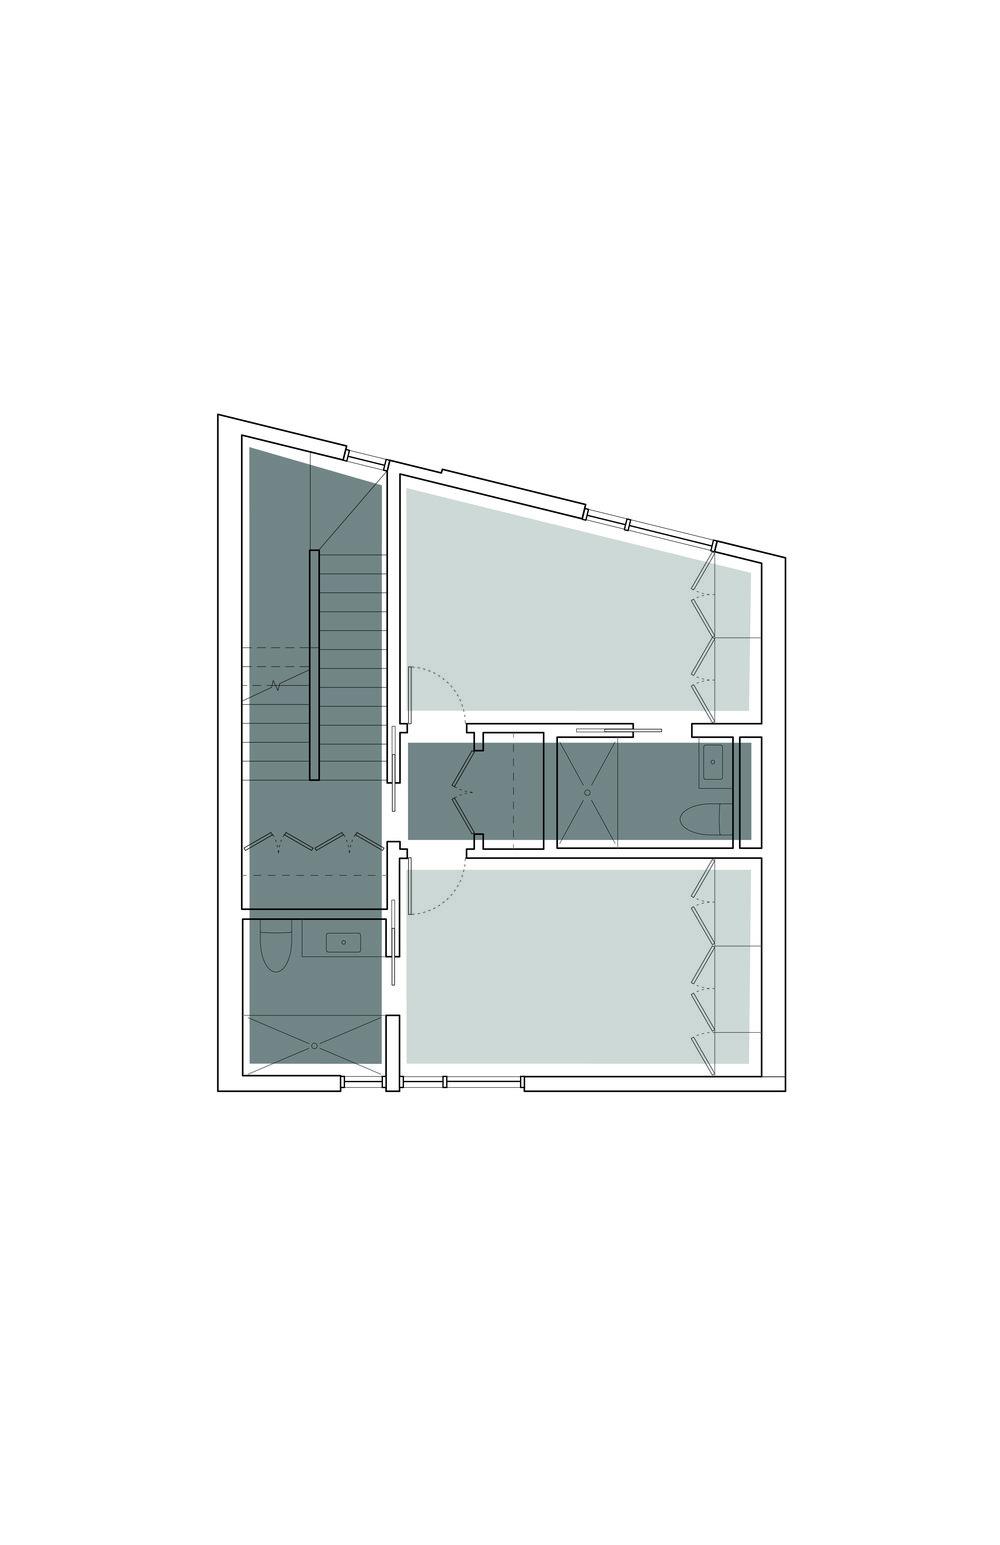 3 THIRD FLOOR - Serv.jpg